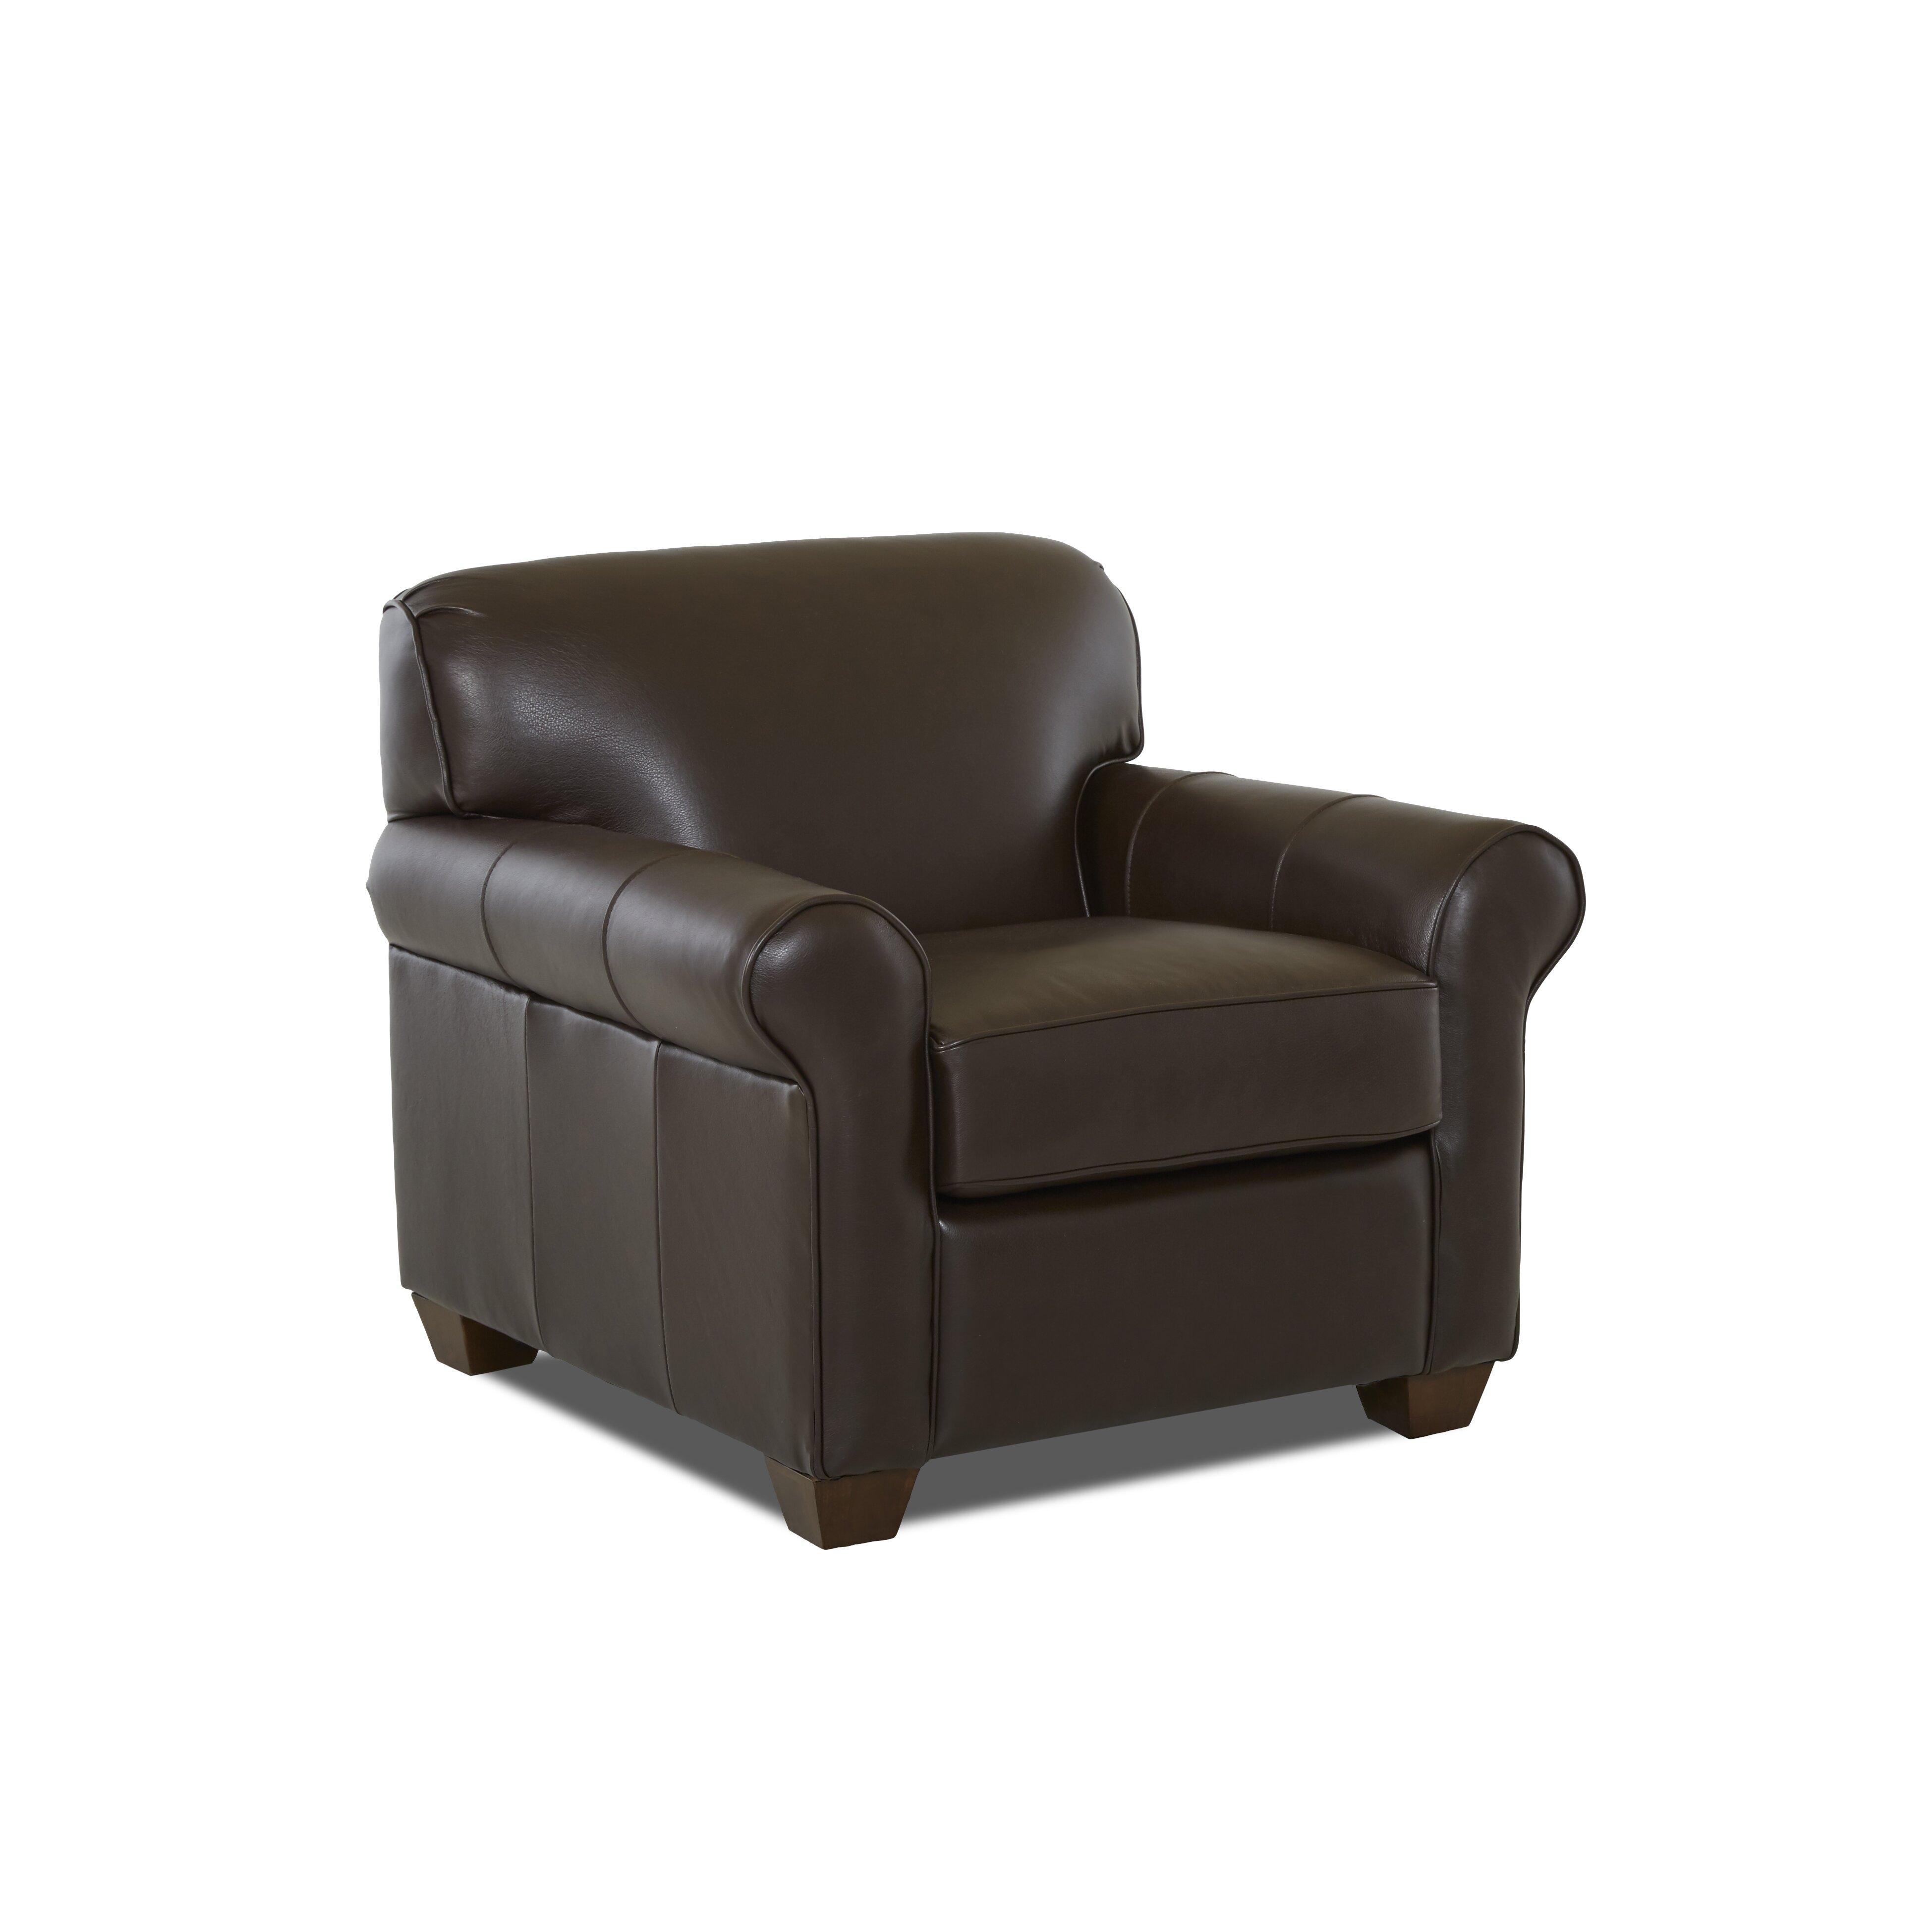 Wayfair custom upholstery jennifer leather sleeper sofa for Leather sectional sofa wayfair